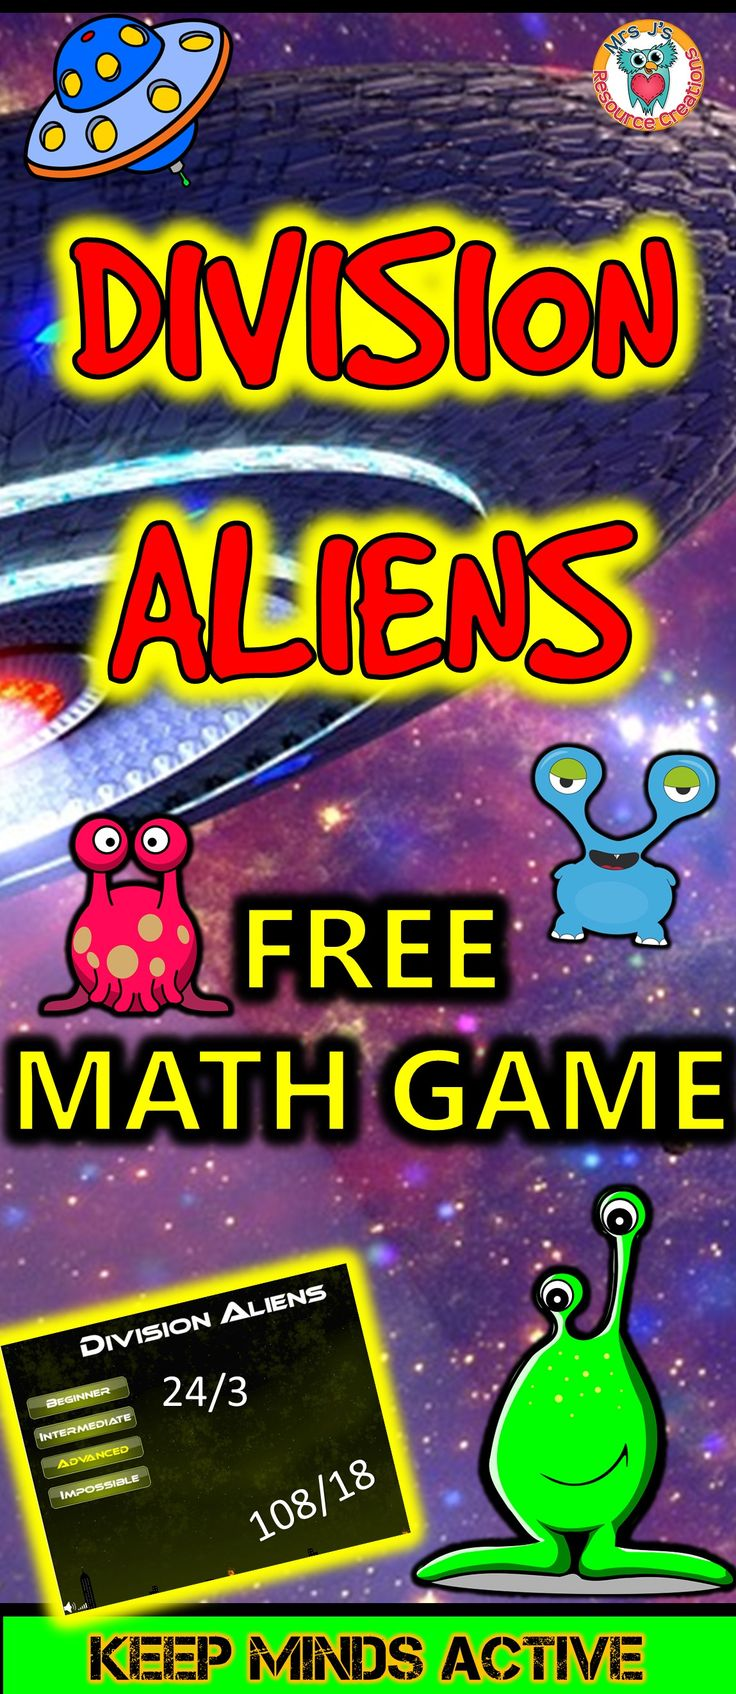 Online Money Games - Math Play - Free Online Math Games